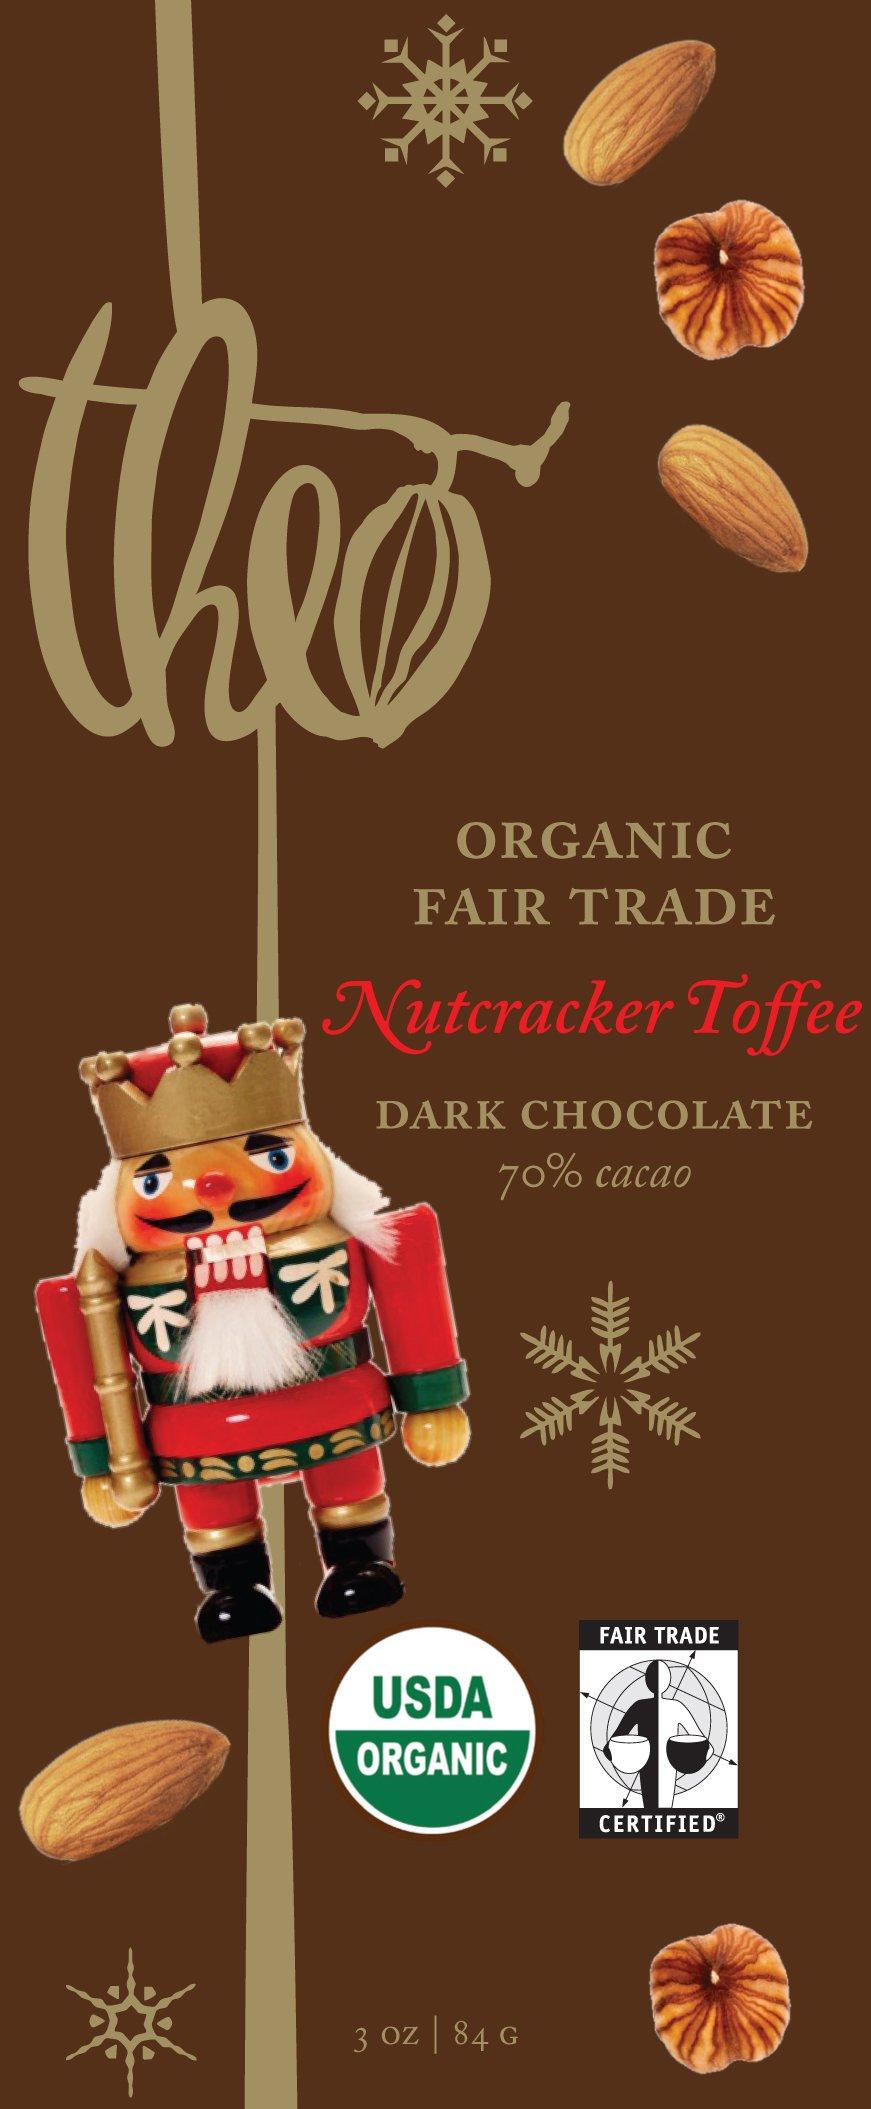 Theo Chocolate Nutcracker Toffee, Dark Chocolate 70% Cacao, 3-Ounce Bars (Pack of 12)